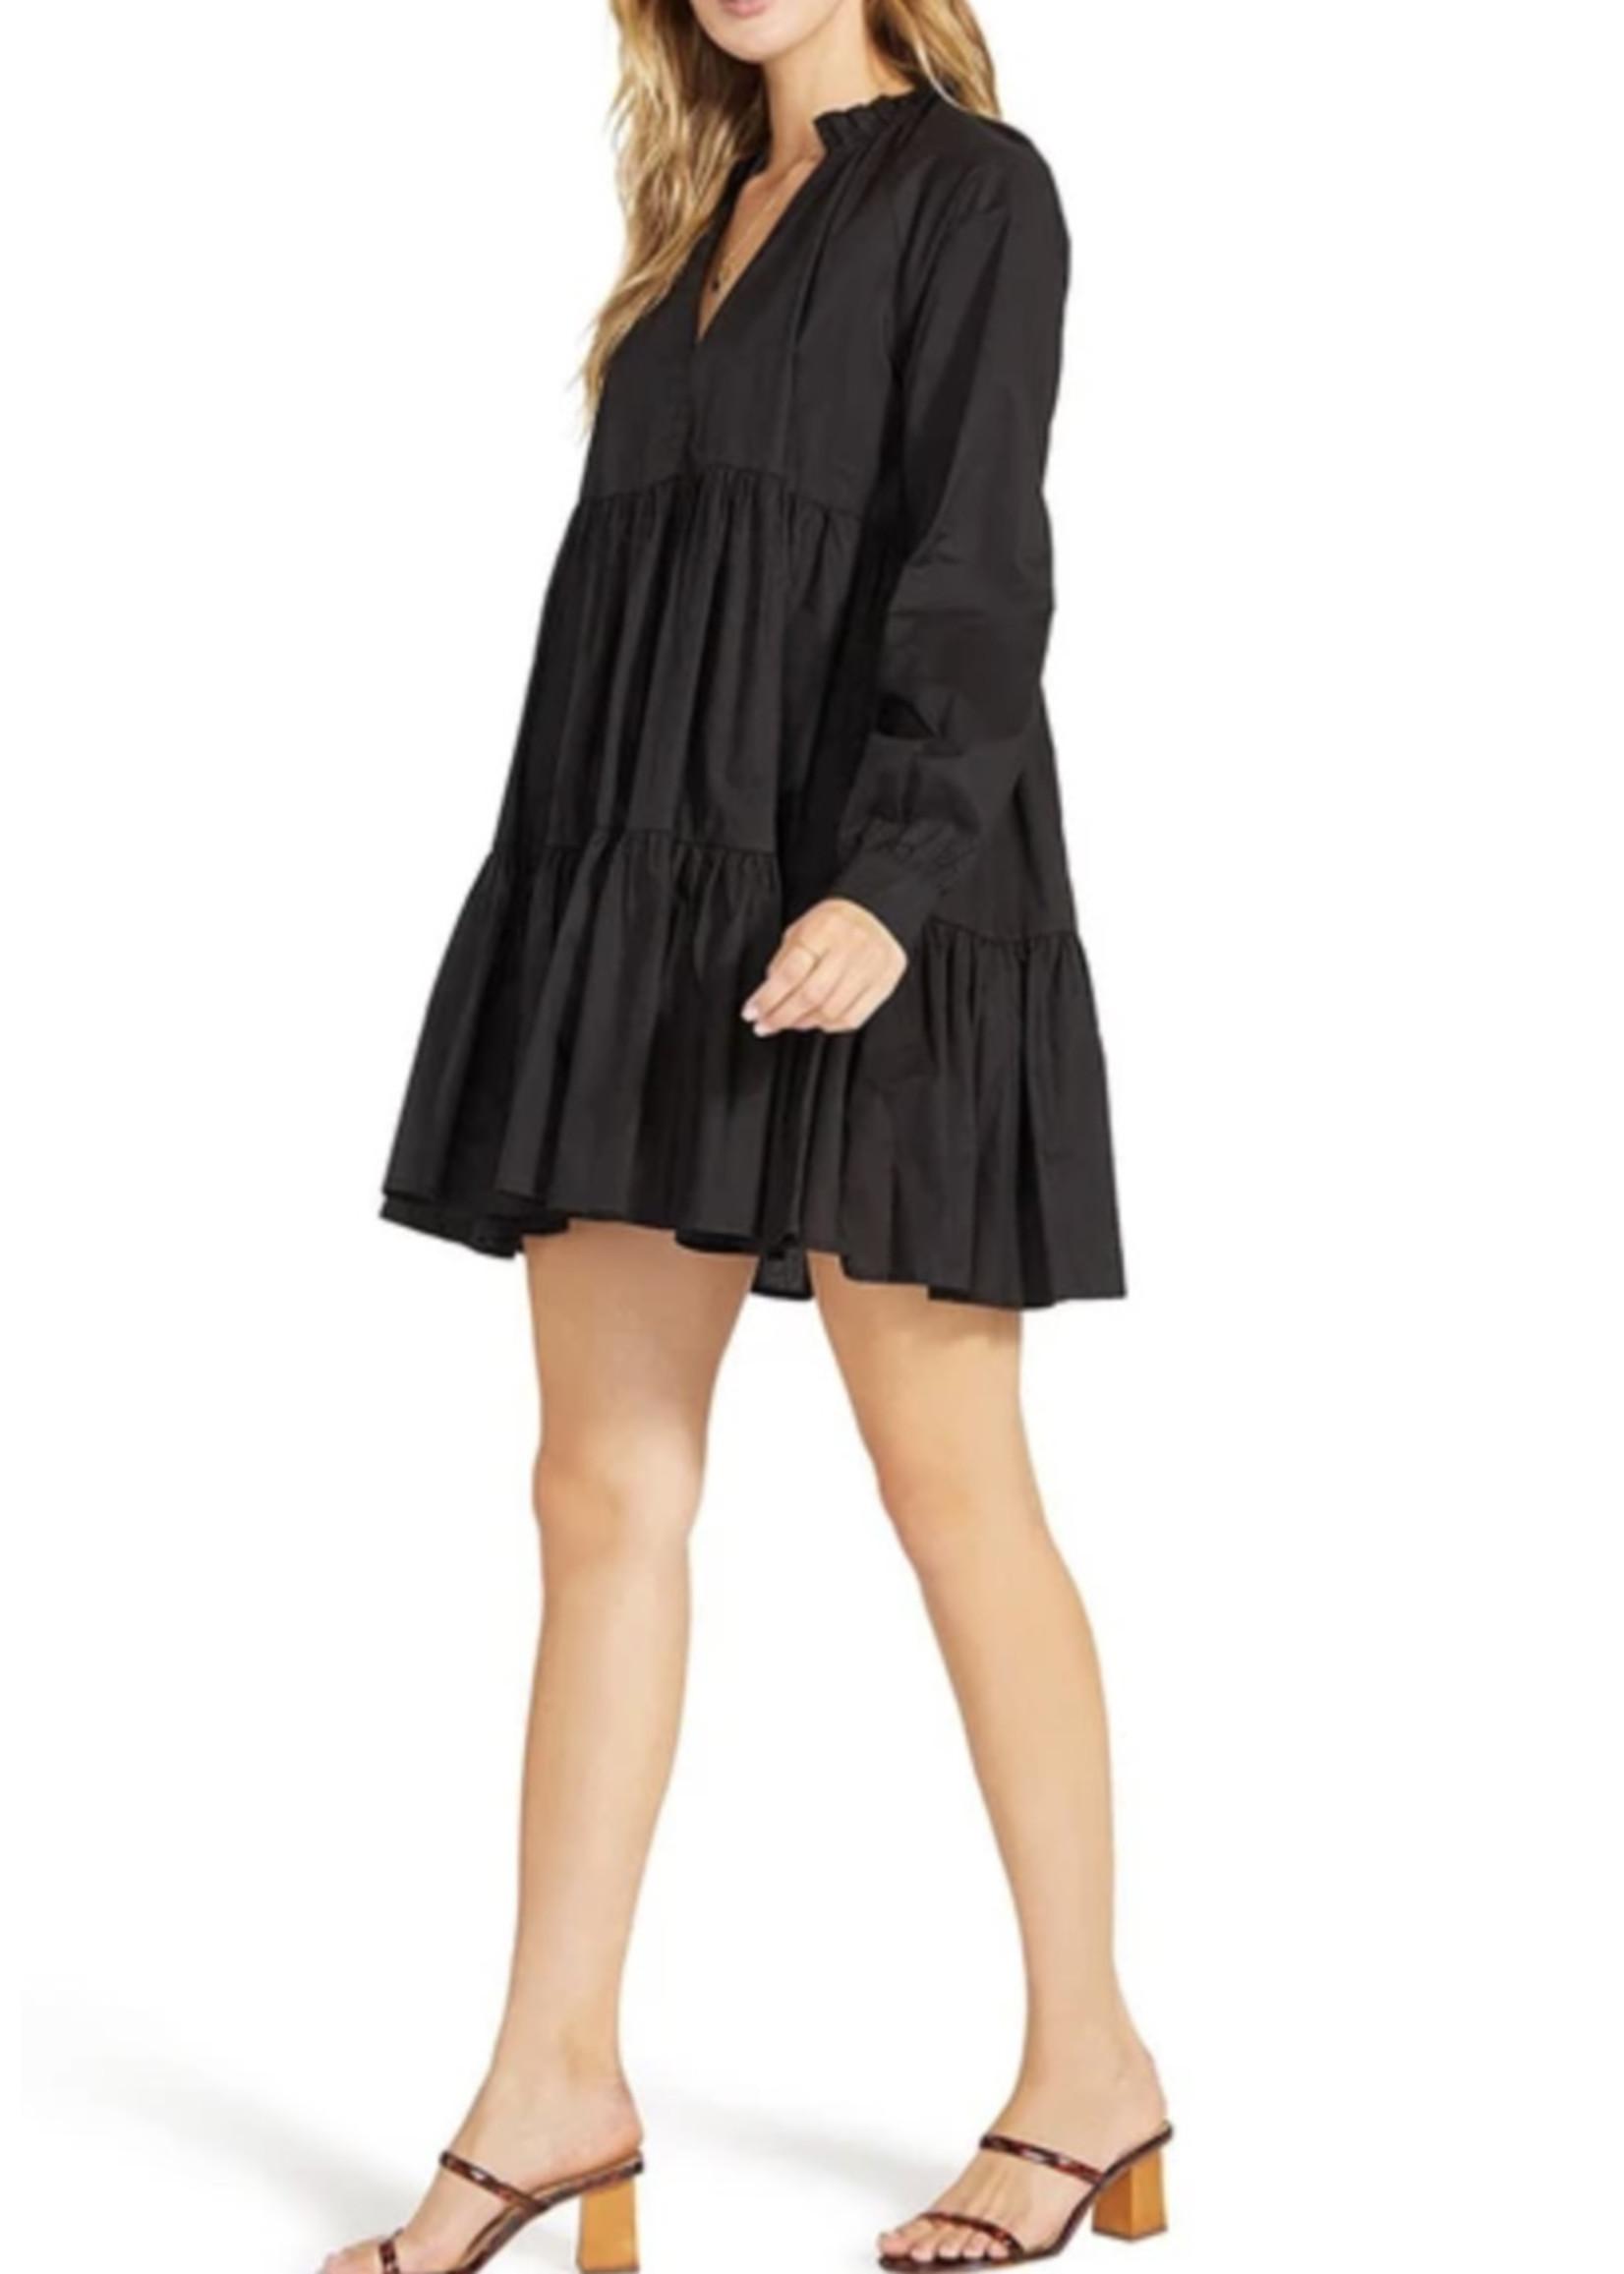 BB Dakota These Days Dress - BL108025